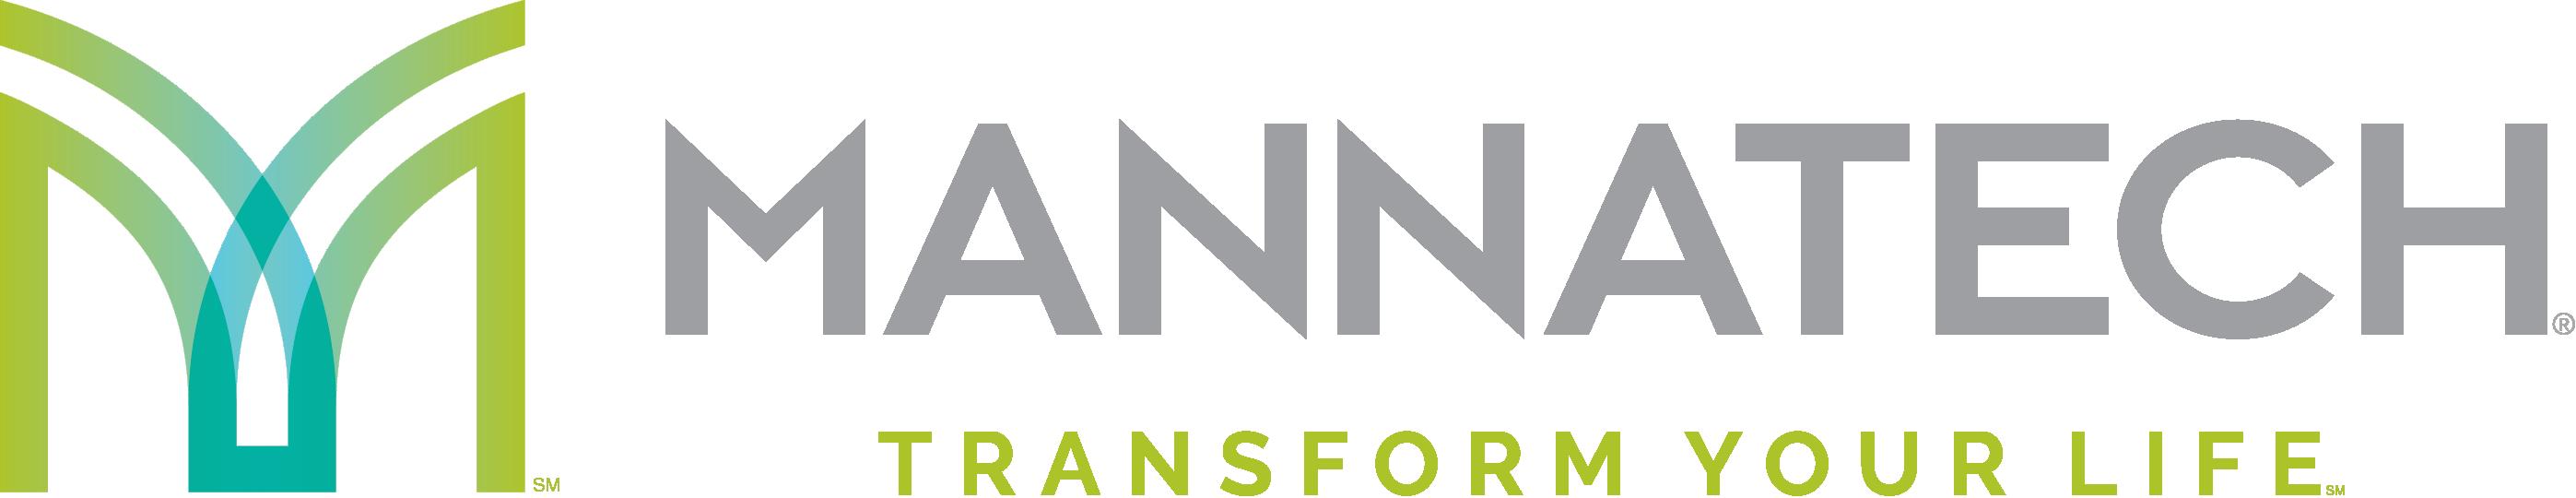 Mannatech, Transform Your Life